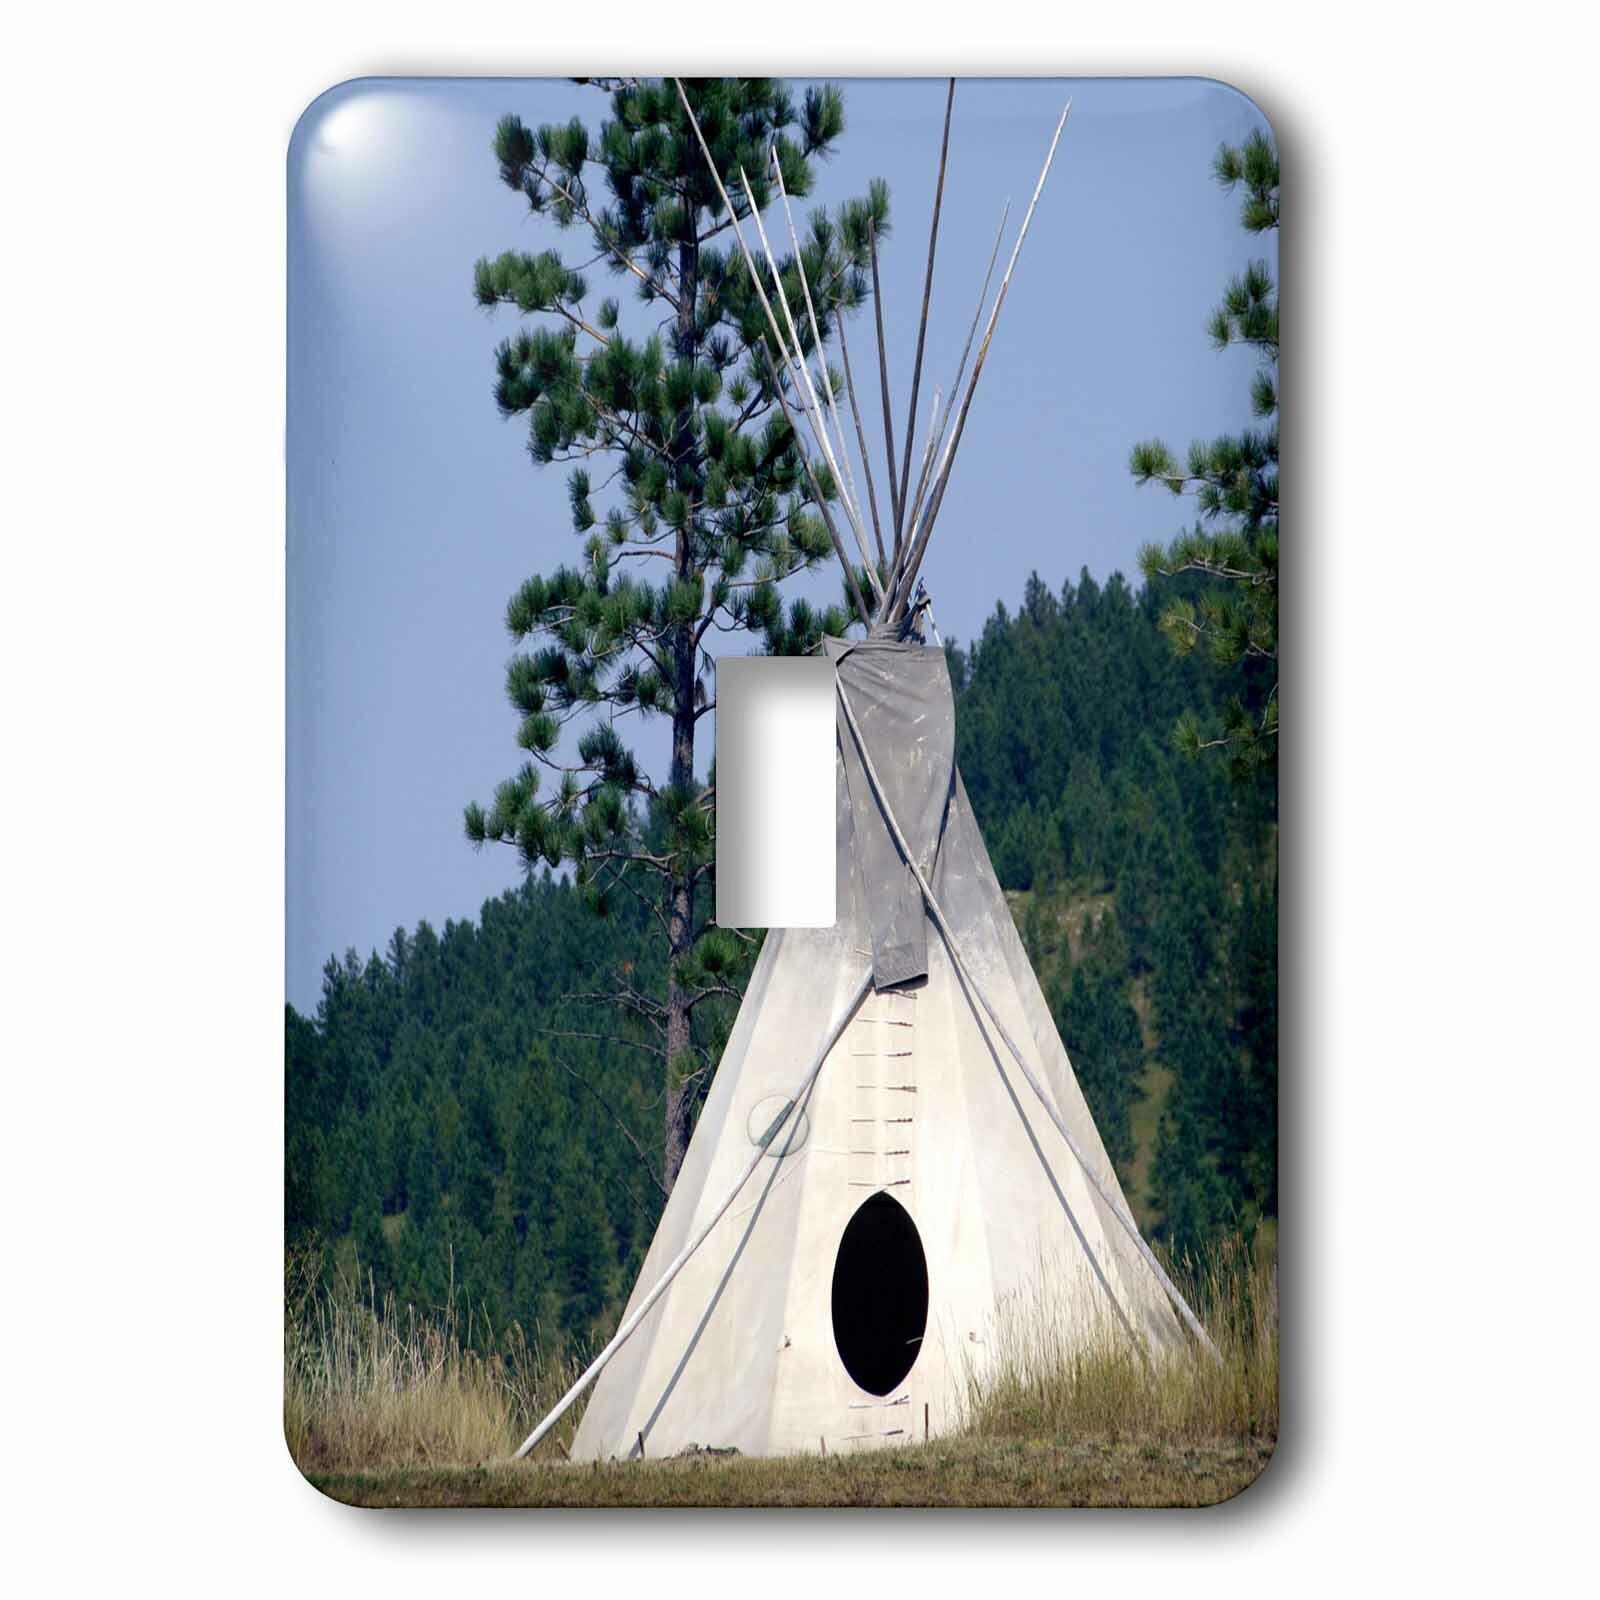 3drose Sd Lakota Indian Teepee Native American 1 Gang Toggle Light Switch Wall Plate Wayfair